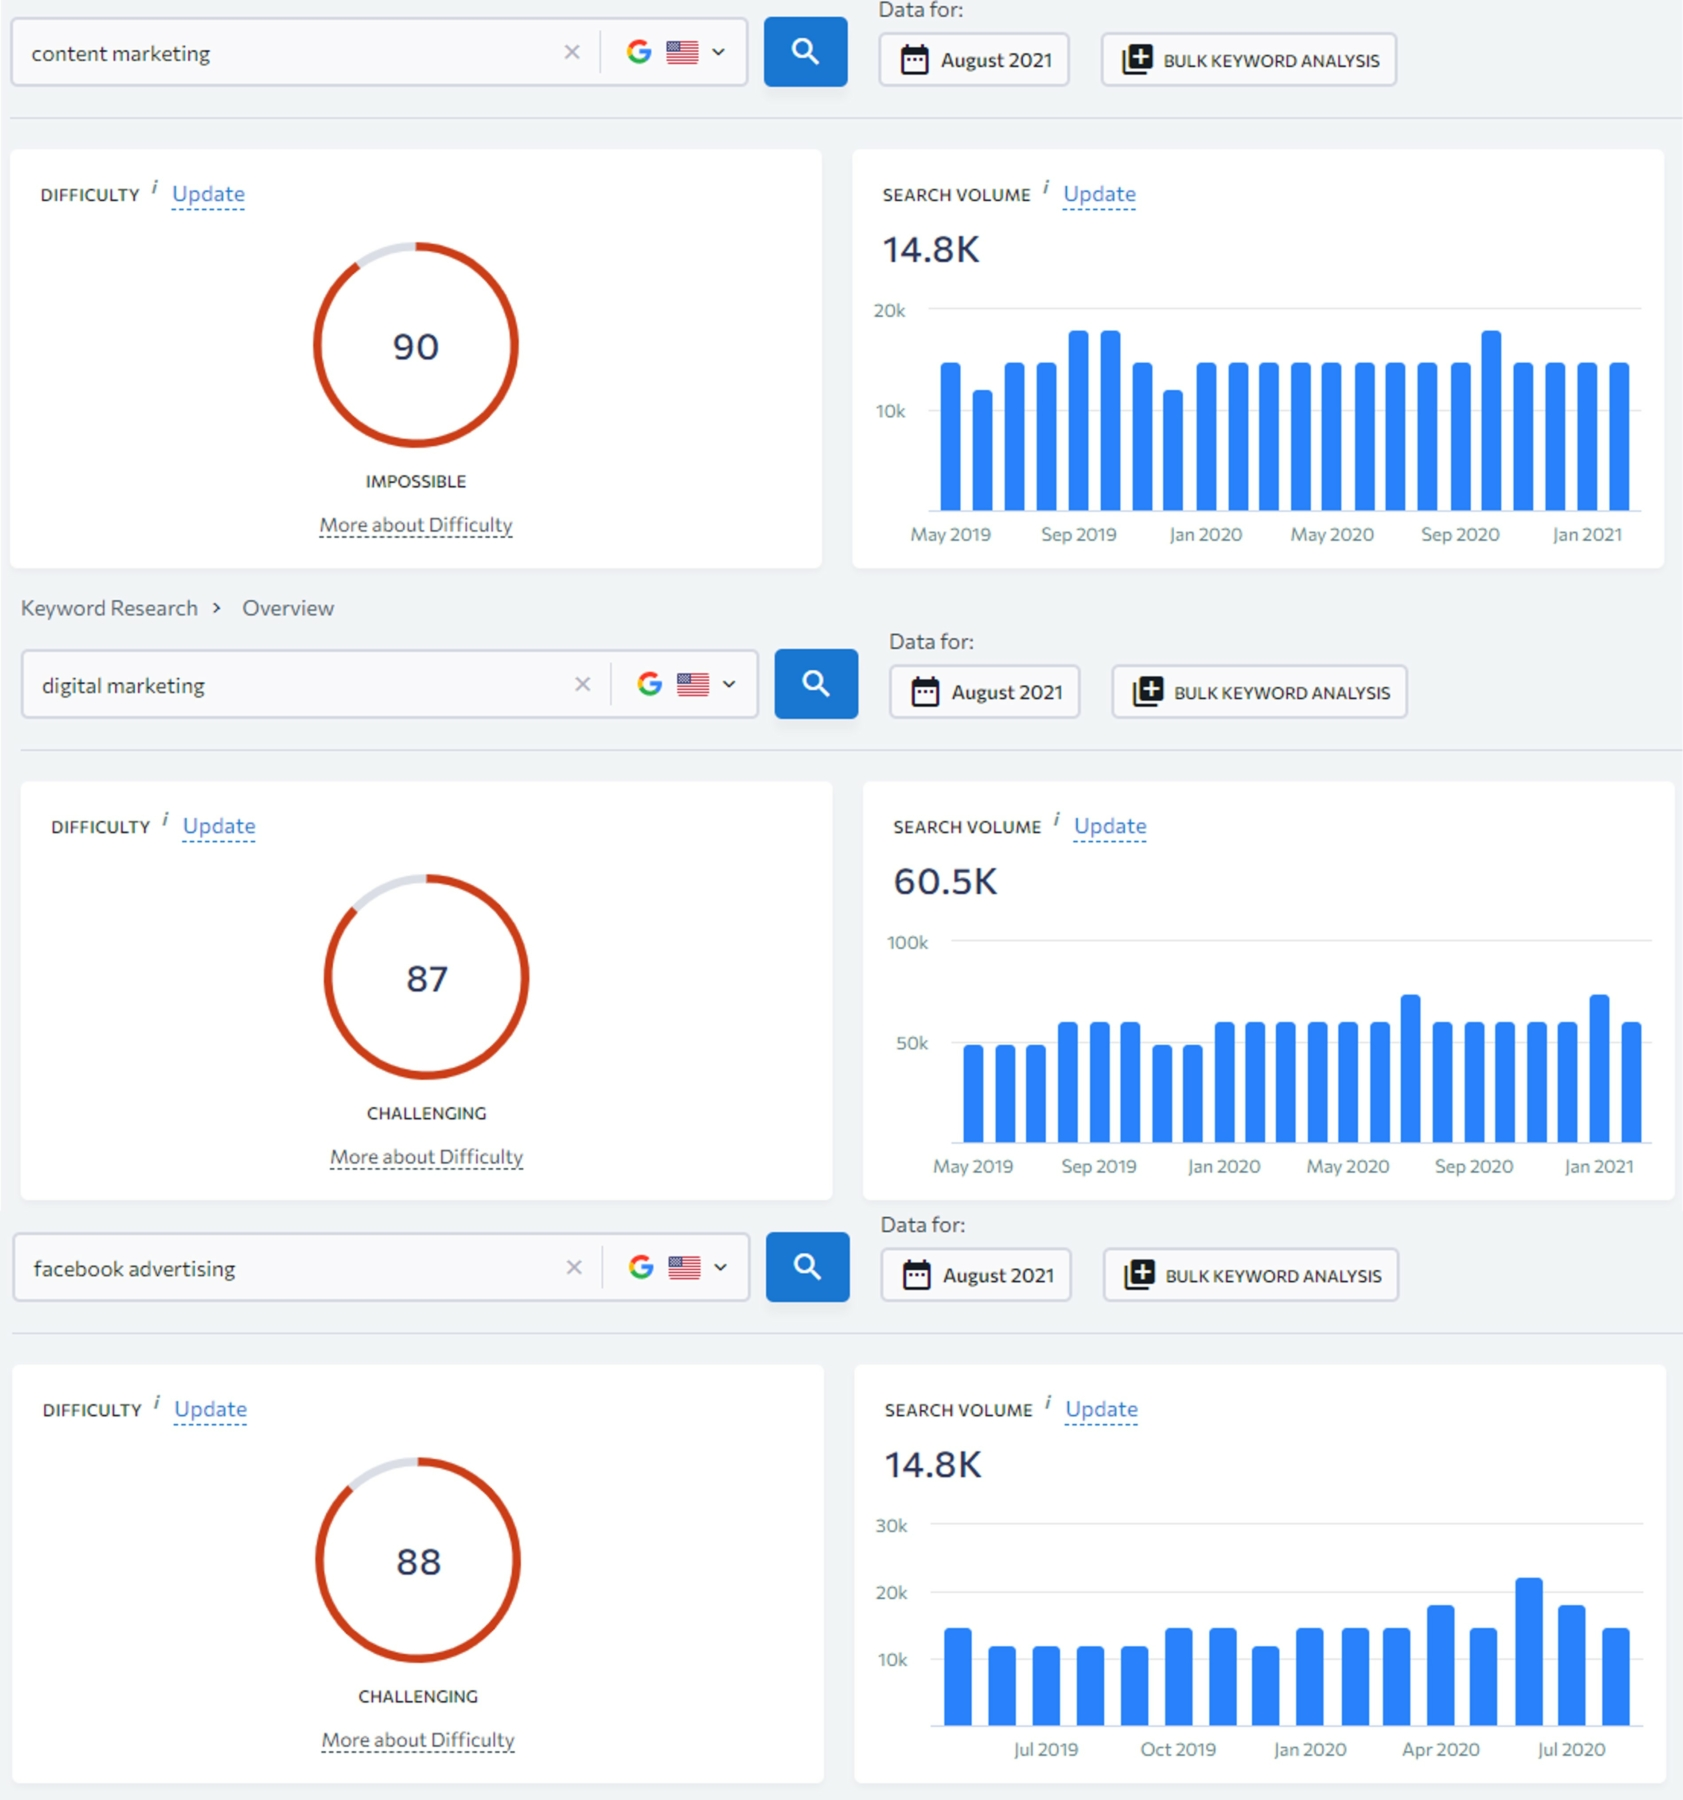 seo keywords with high traffic